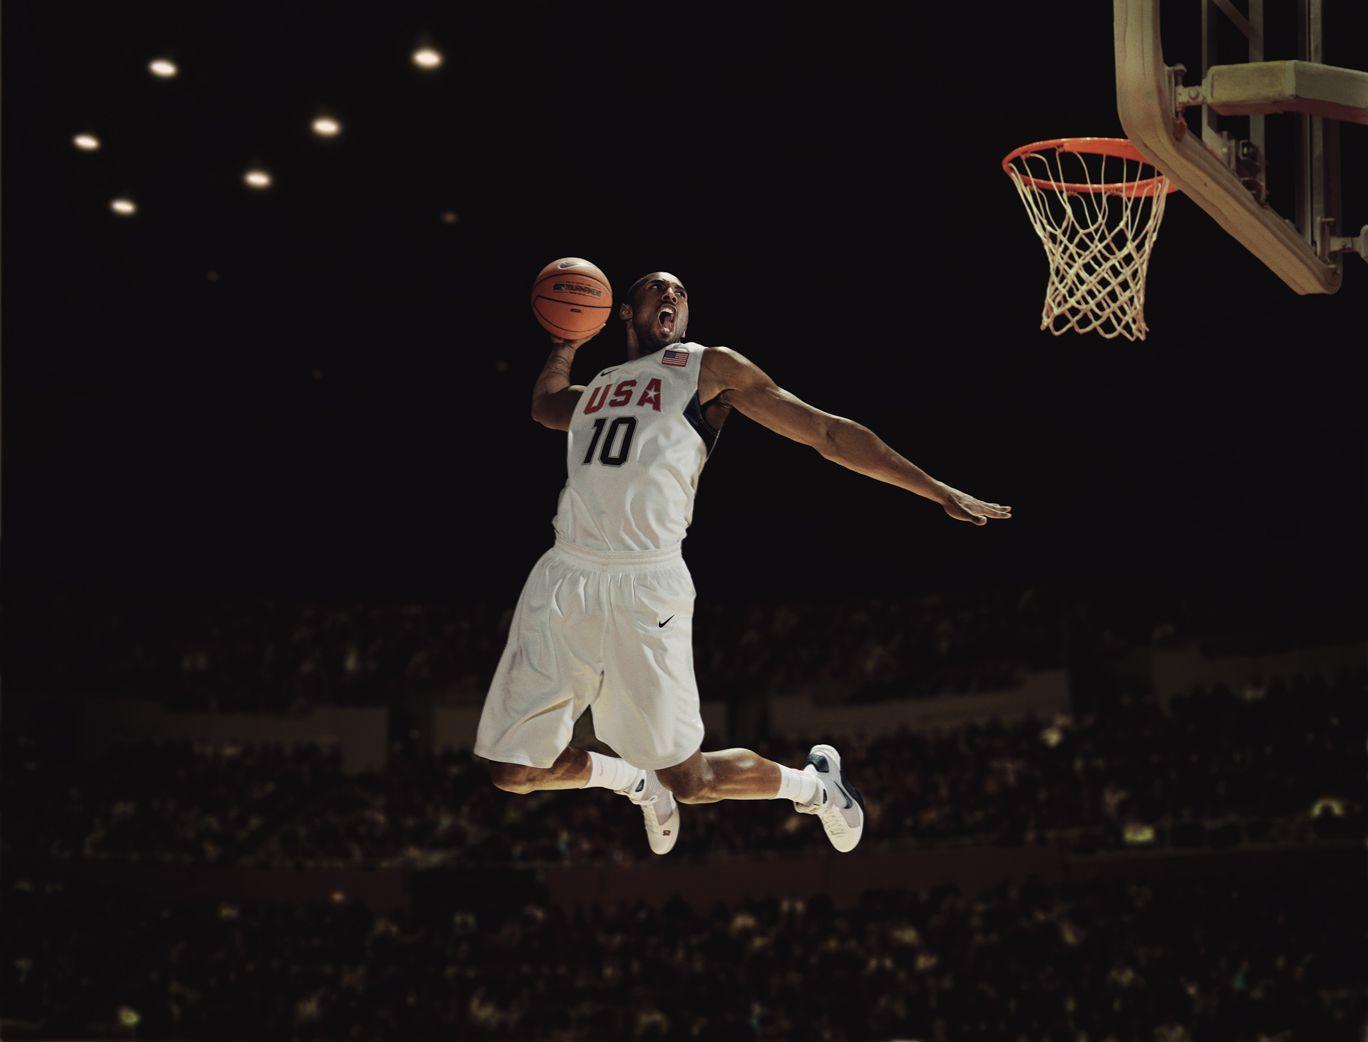 Kobe Bryant Wallpapers - Kobe Bryant Usa Dunk - HD Wallpaper